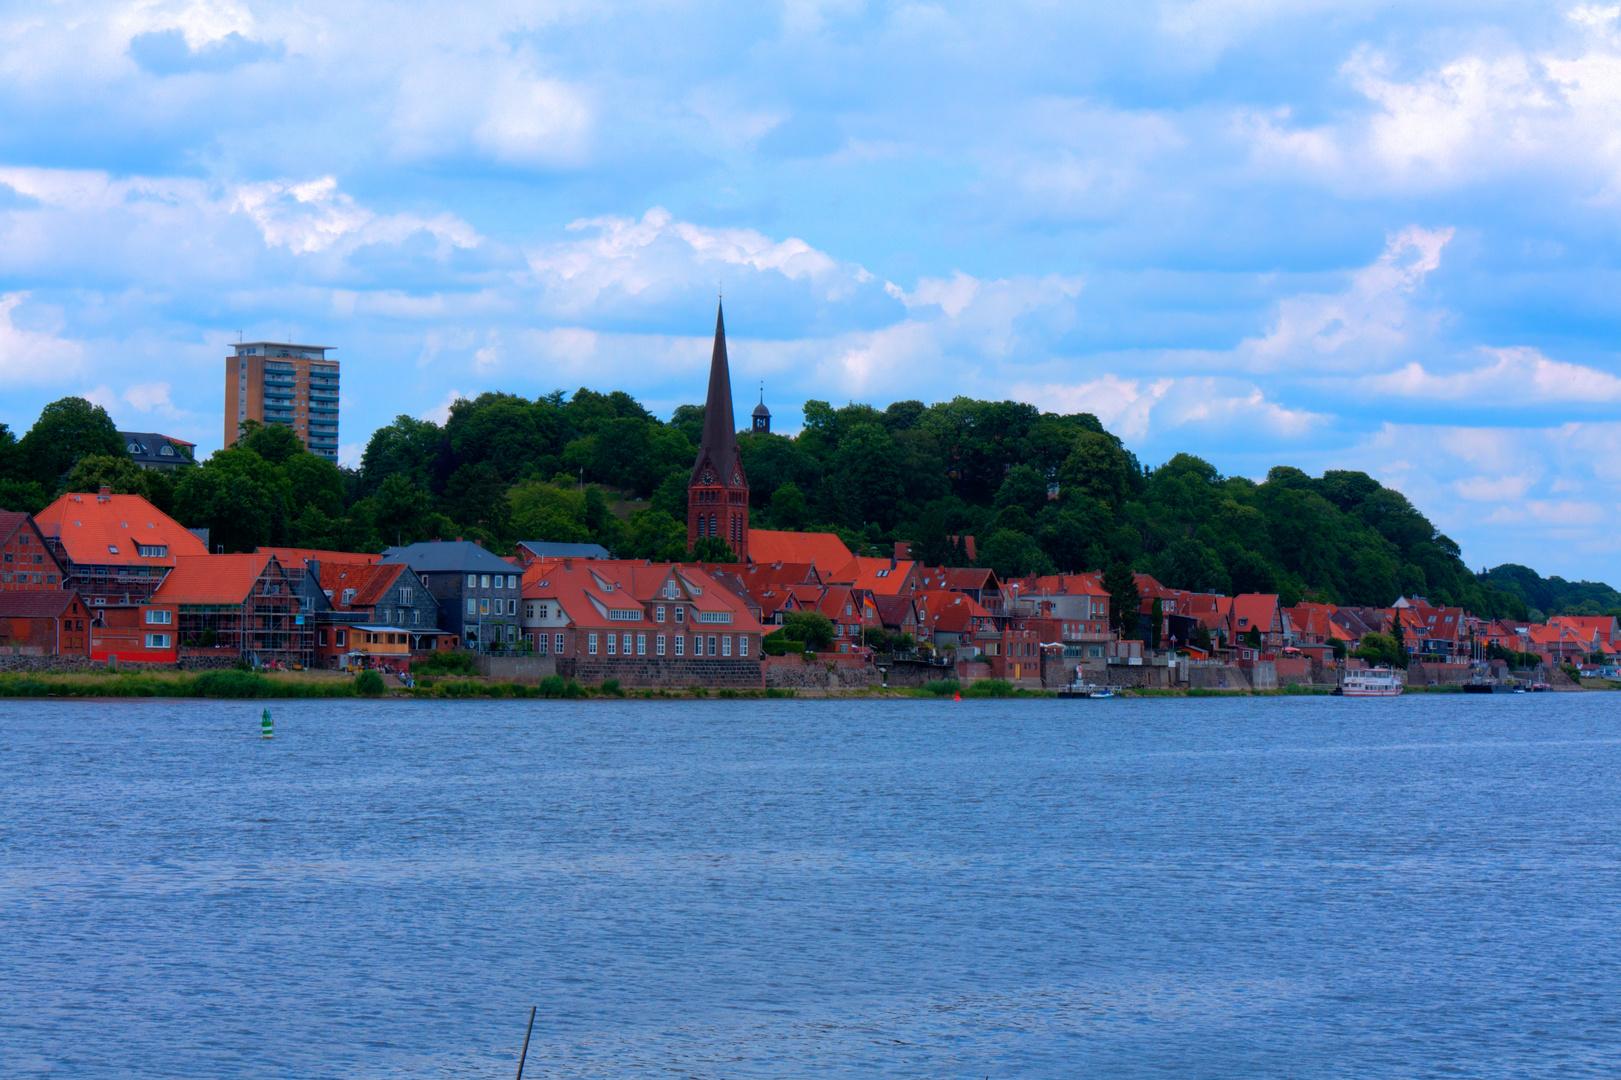 Lauenburg - HDR